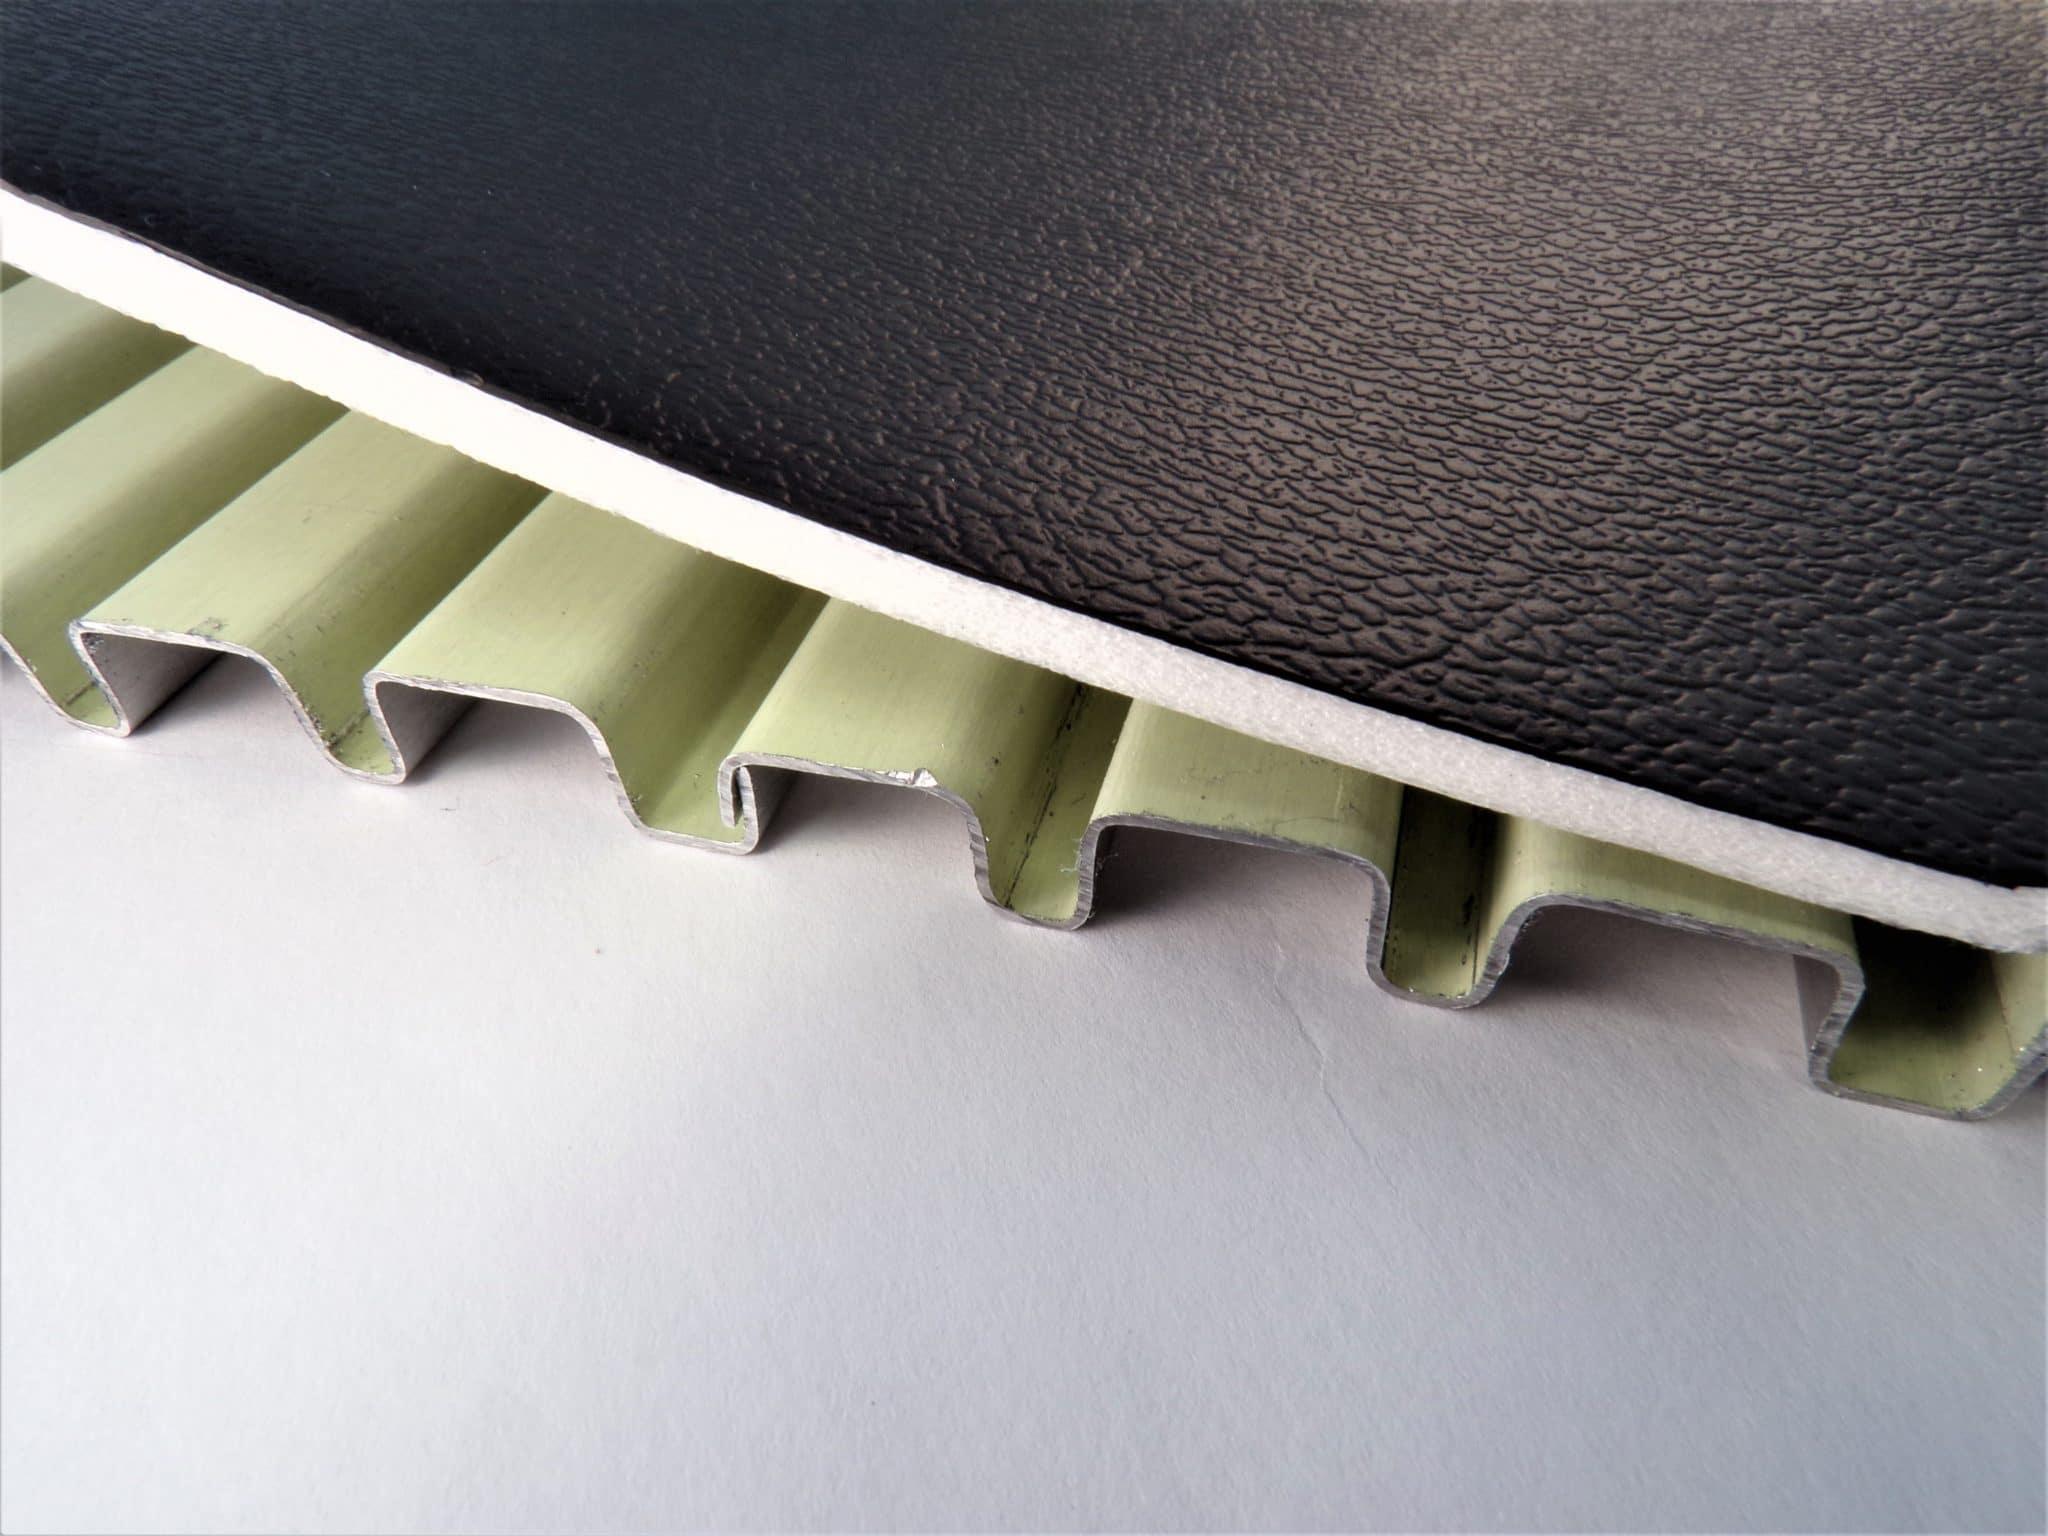 Armortek Lining Guarantees Years of Durability